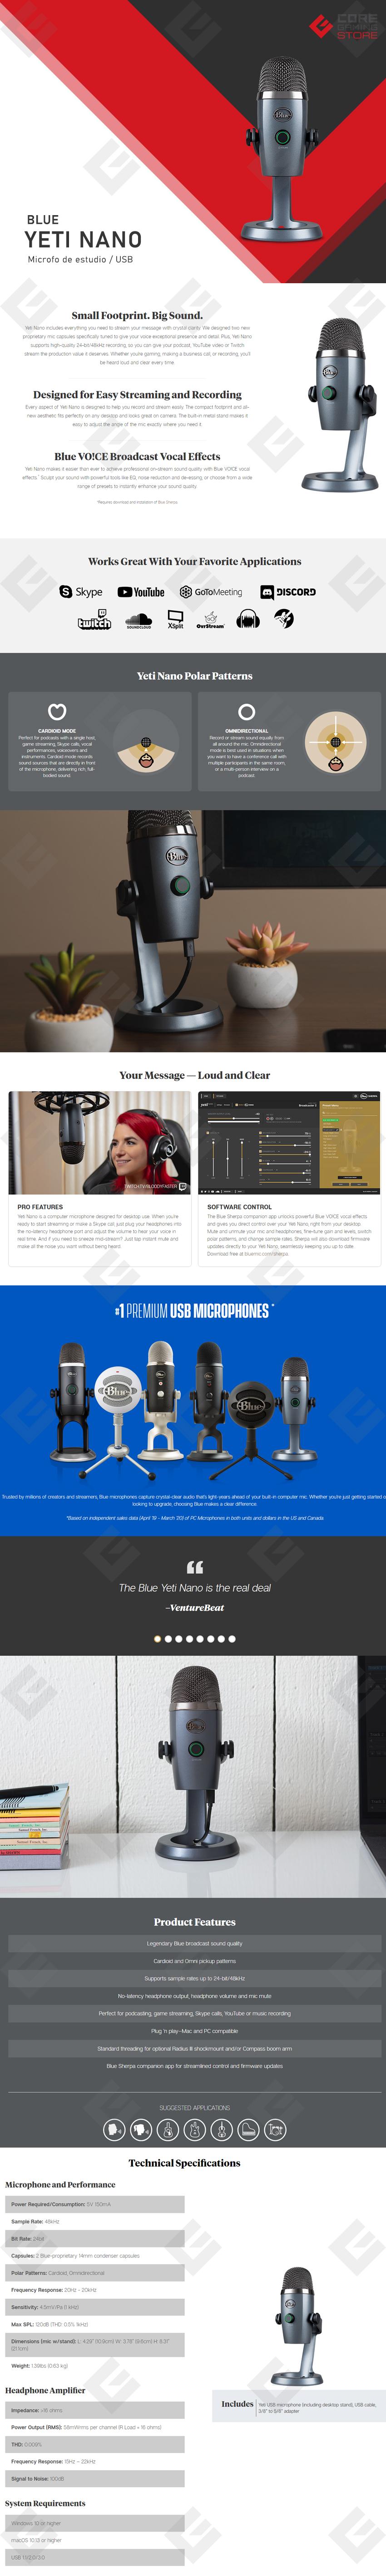 Microfono Blue Yeti Nano, Plug-And-Play USB (Logitech)